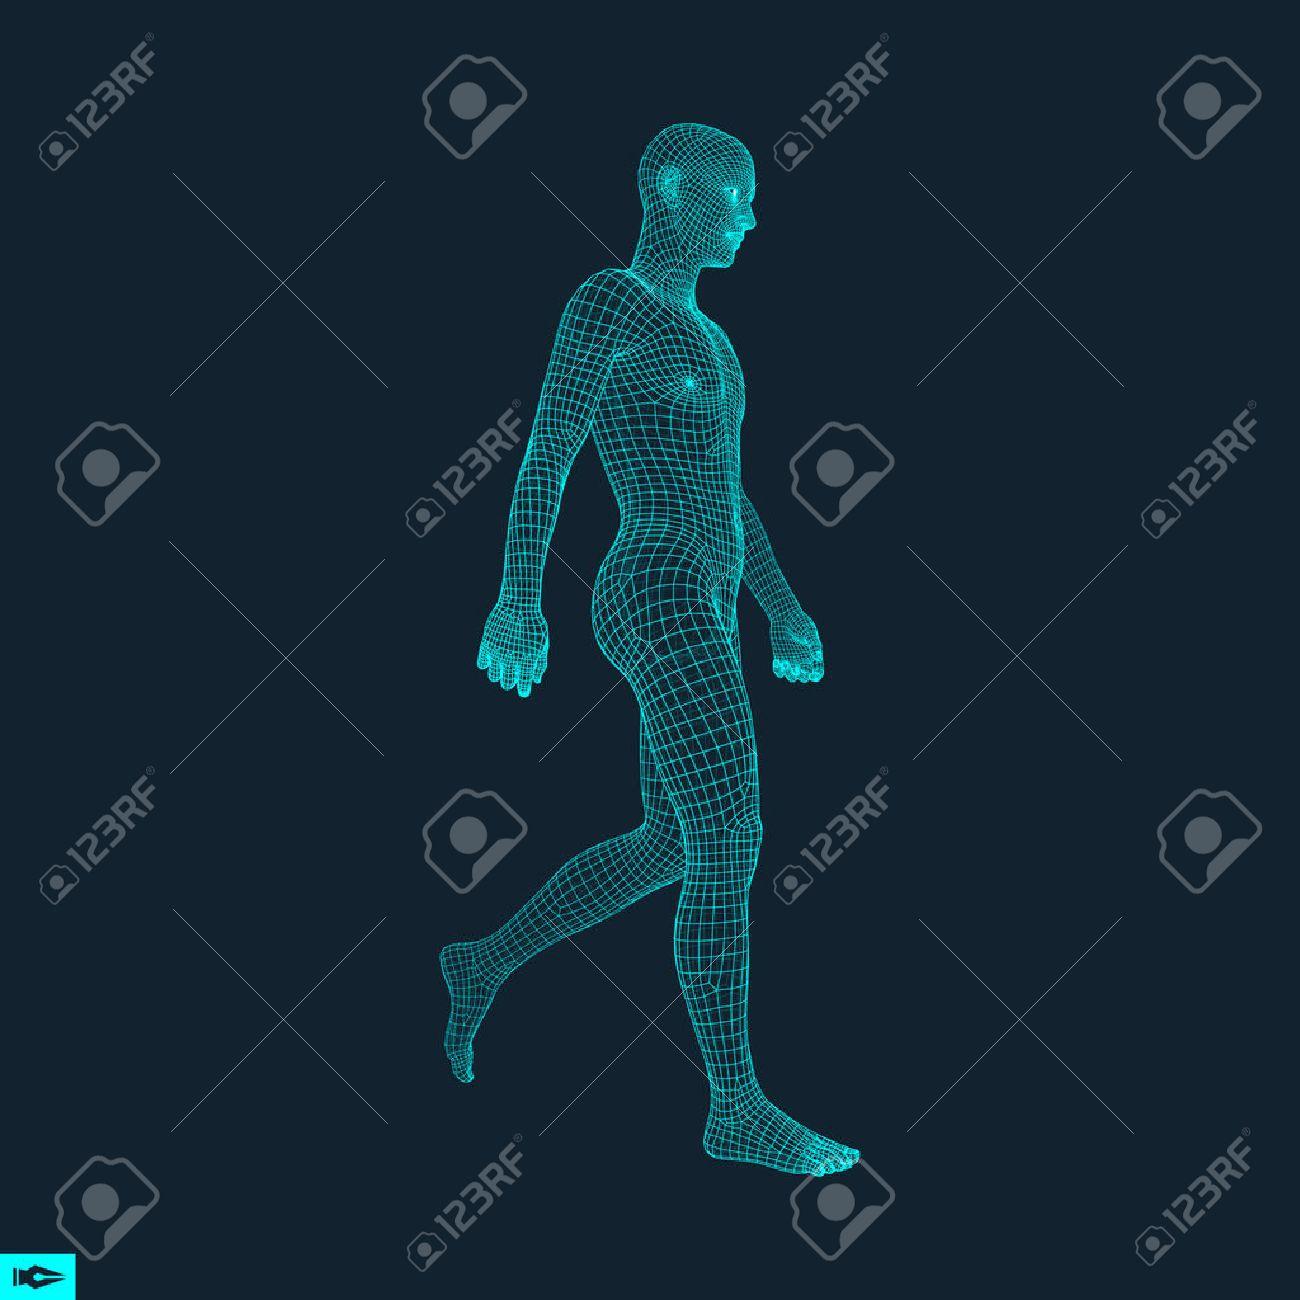 Walking Man. 3D Human Body Model. Geometric Design. Human Body Wire Model. Vector Illustration. - 69659317